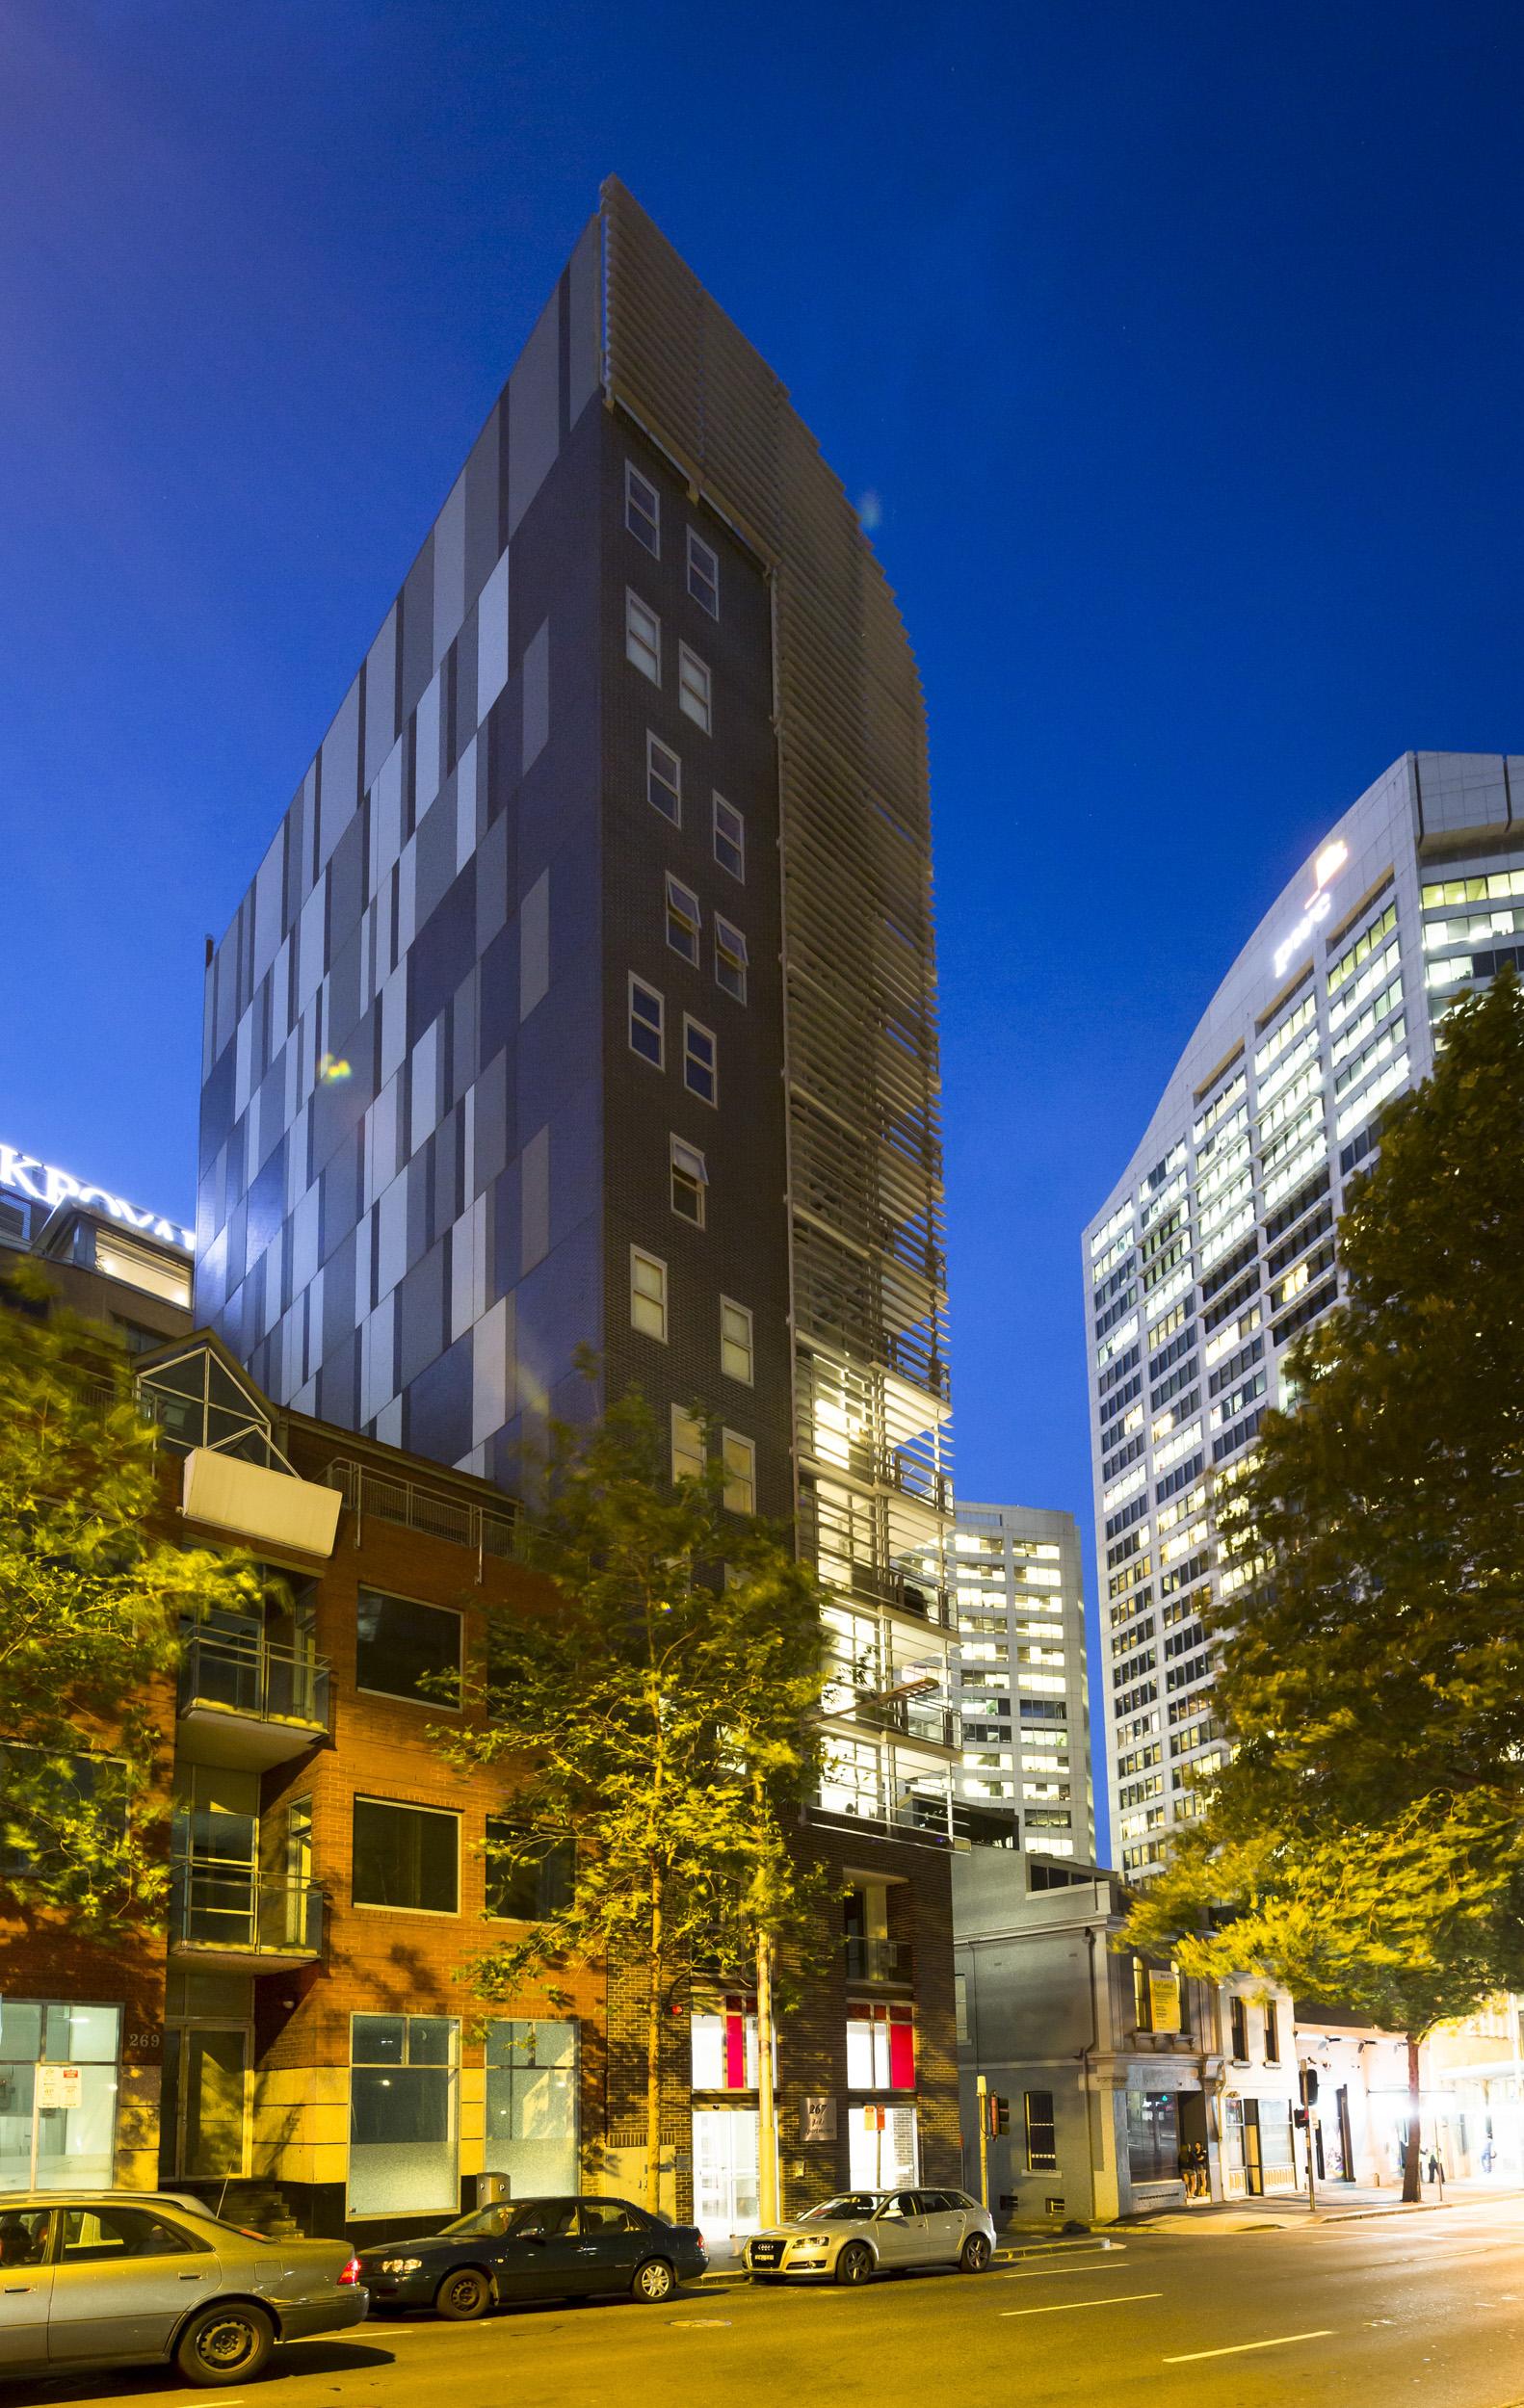 architecture_photography_sydney_australia_19.jpg